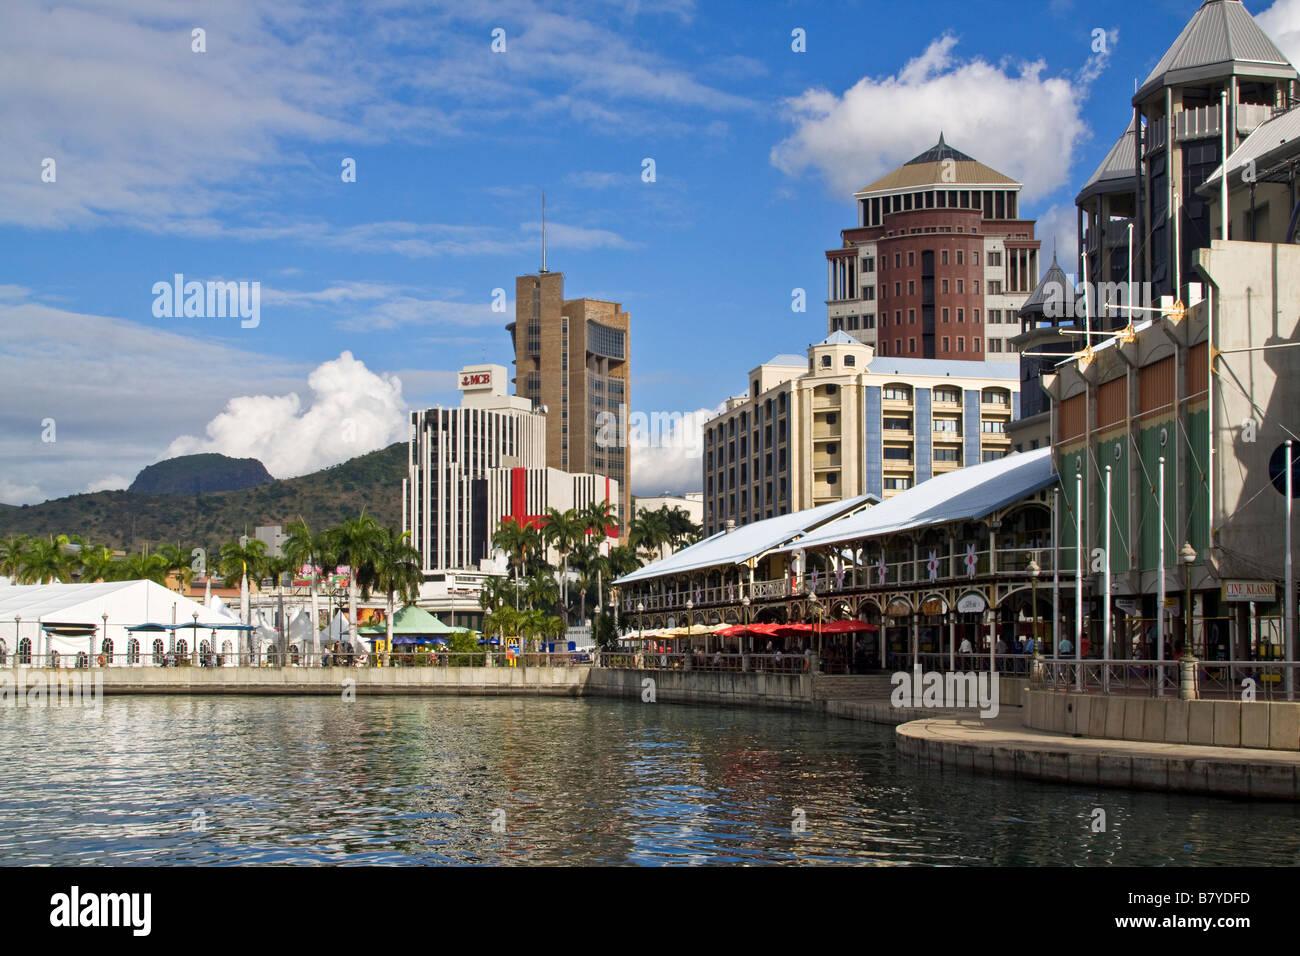 Port louis waterfront downtown city center mauritius - Restaurants in port louis mauritius ...